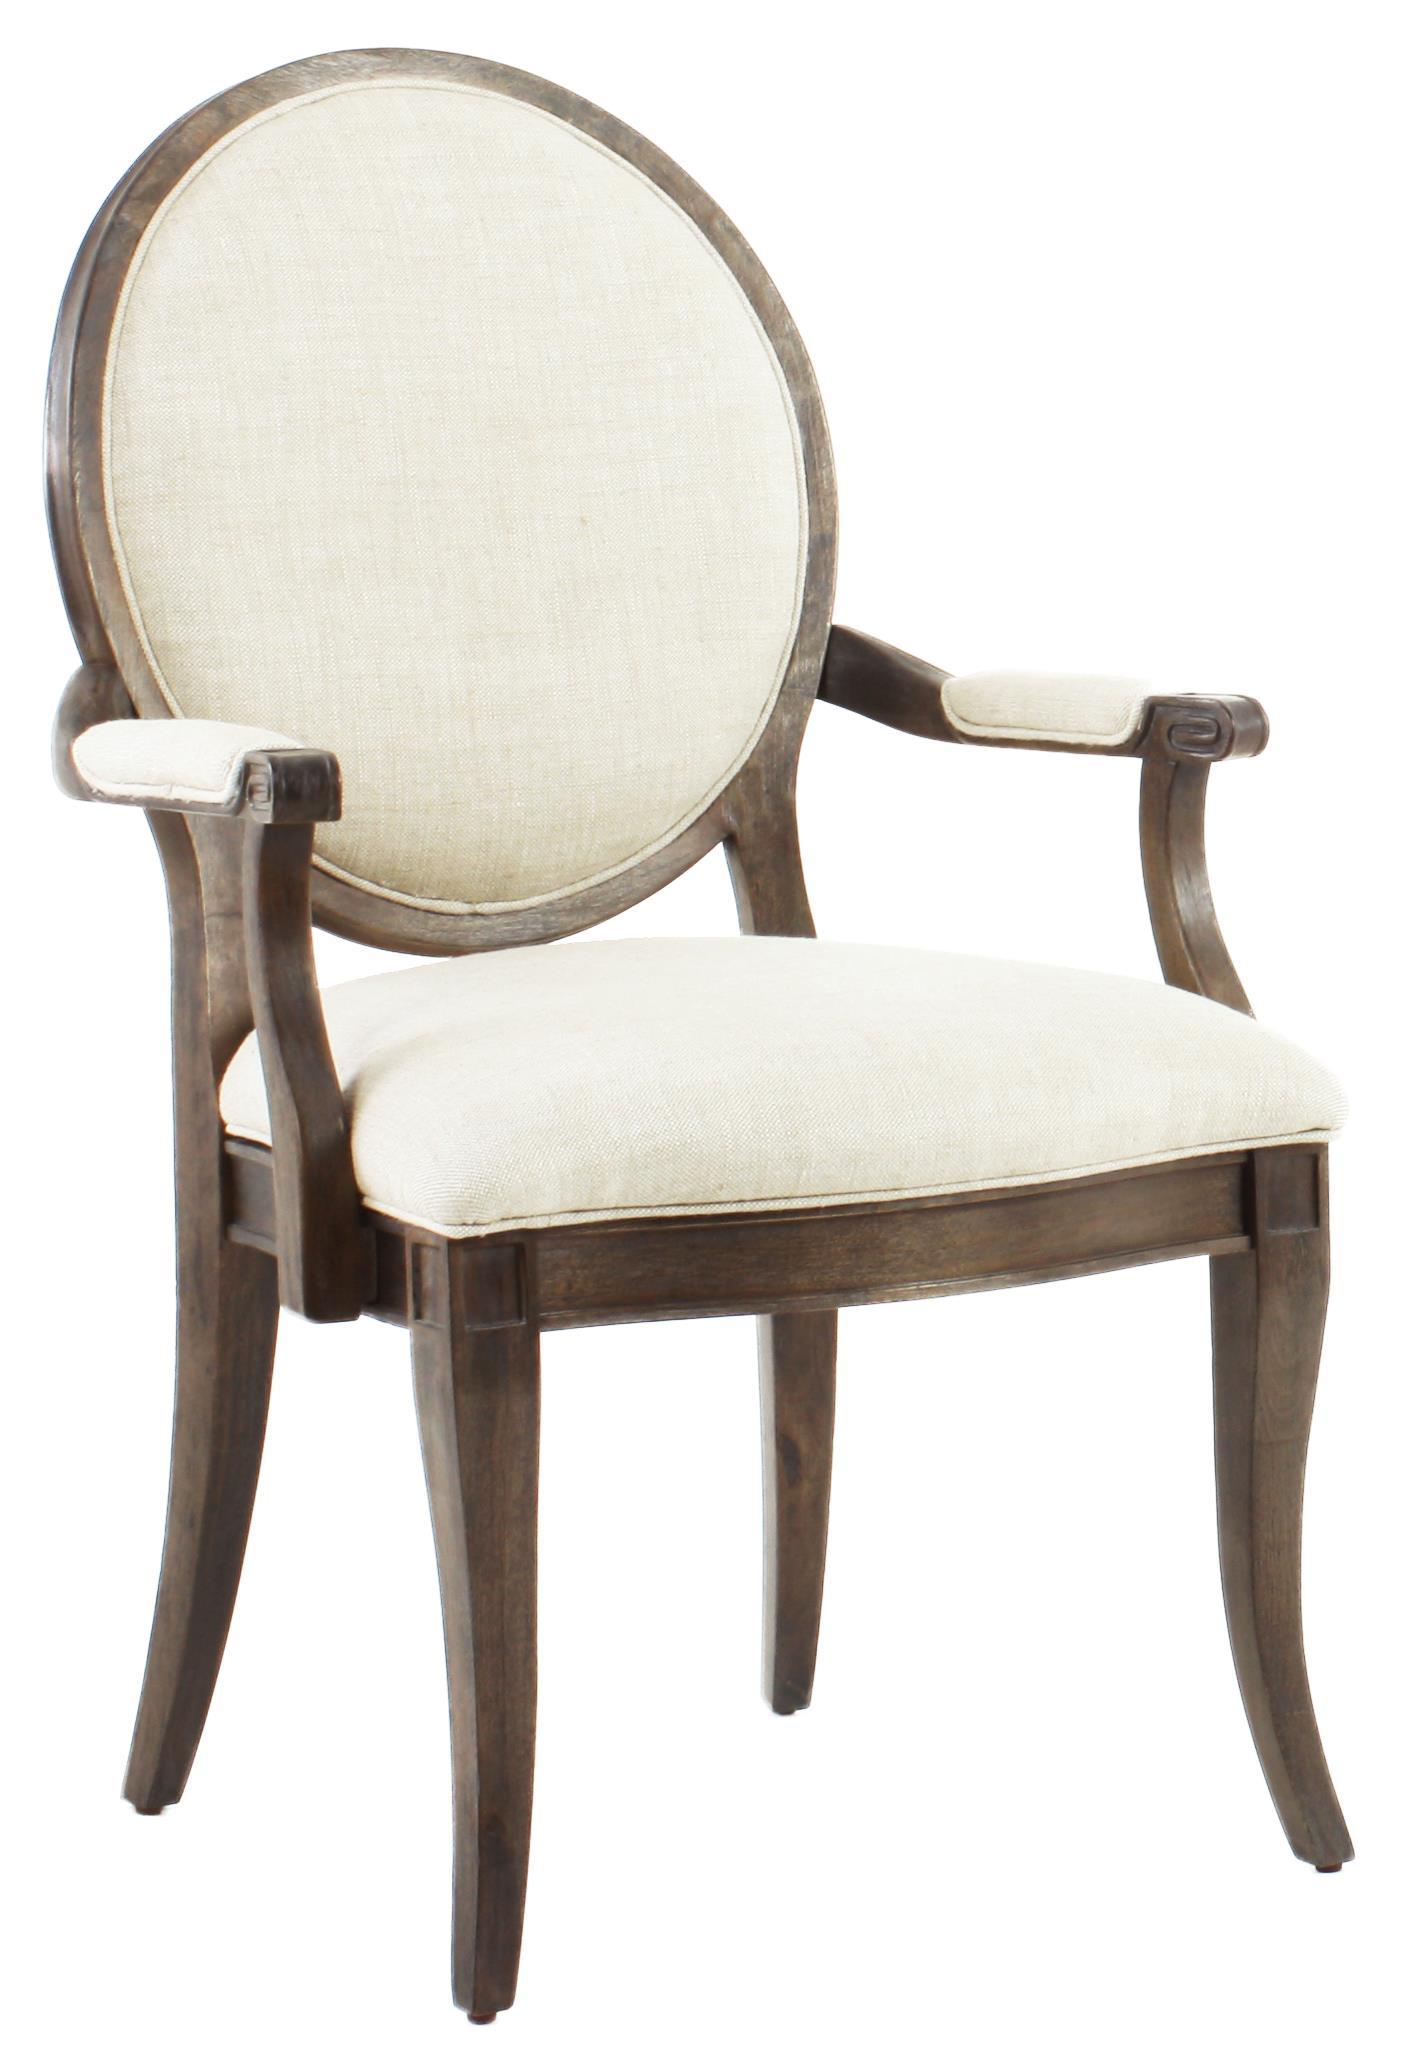 Saint Germain Oval Back Arm Chair by Klien Furniture at Sprintz Furniture